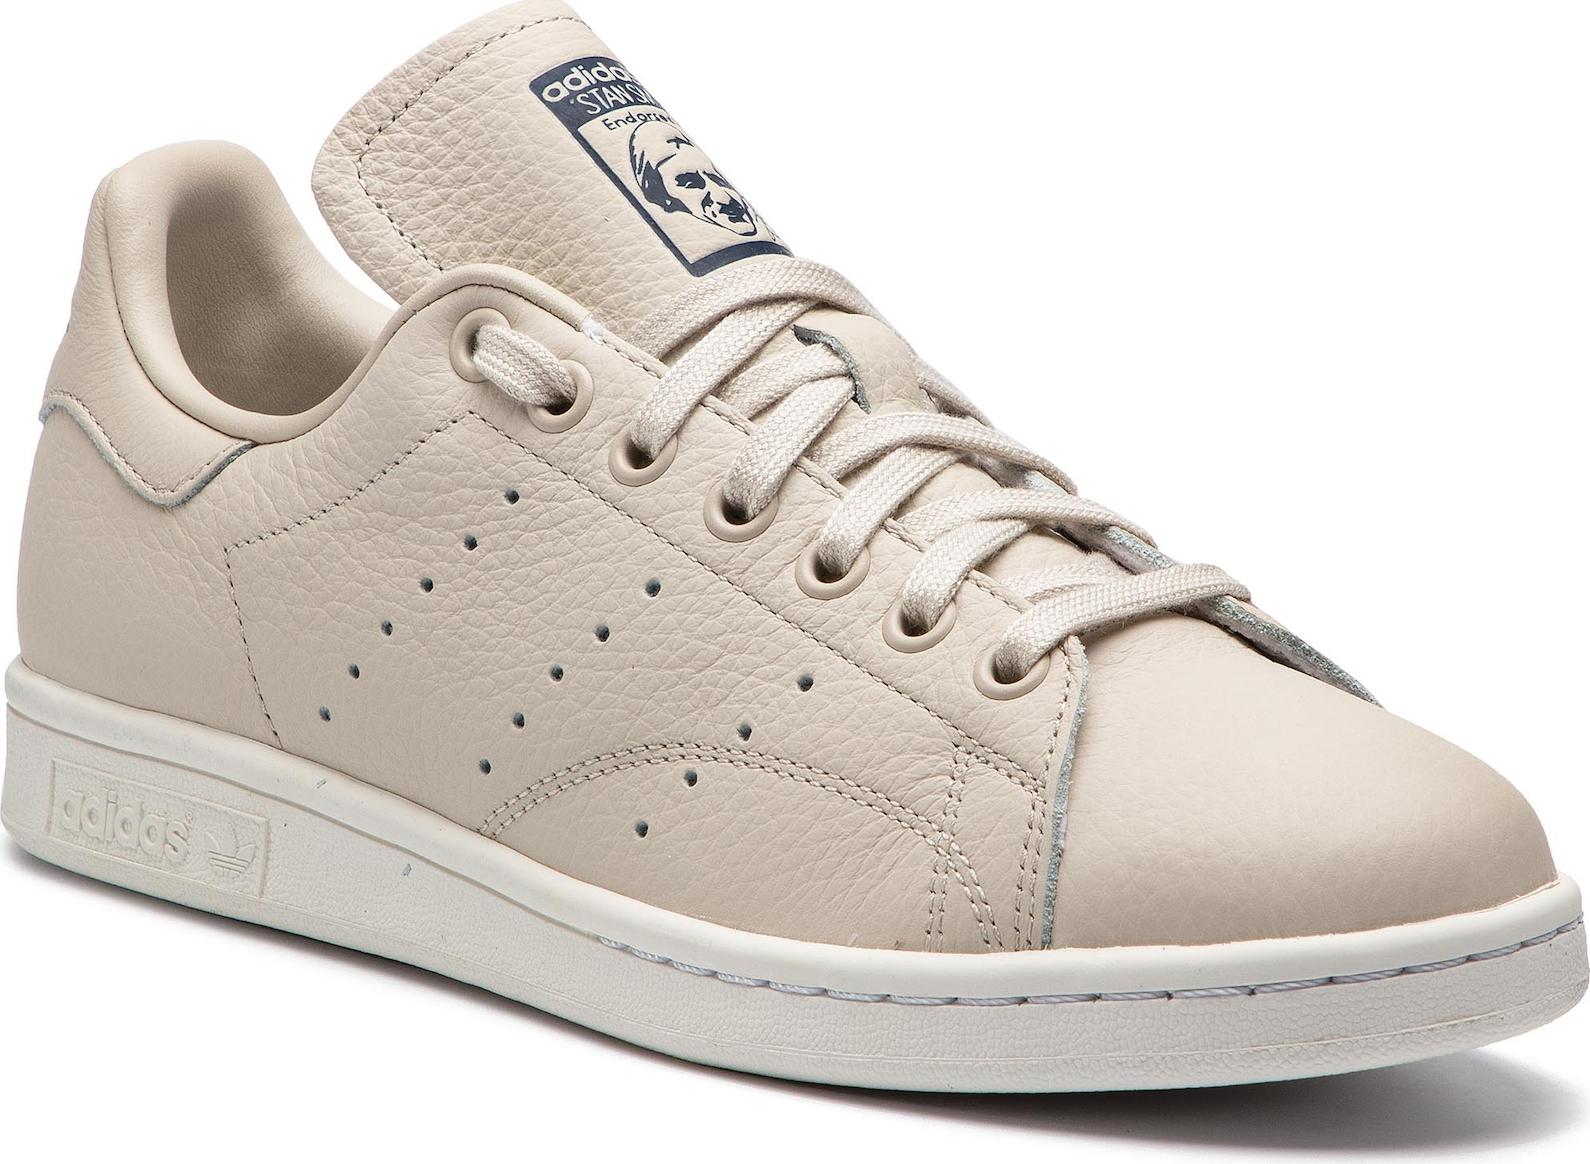 Adidas Stan Smith BD7449 - Skroutz.gr